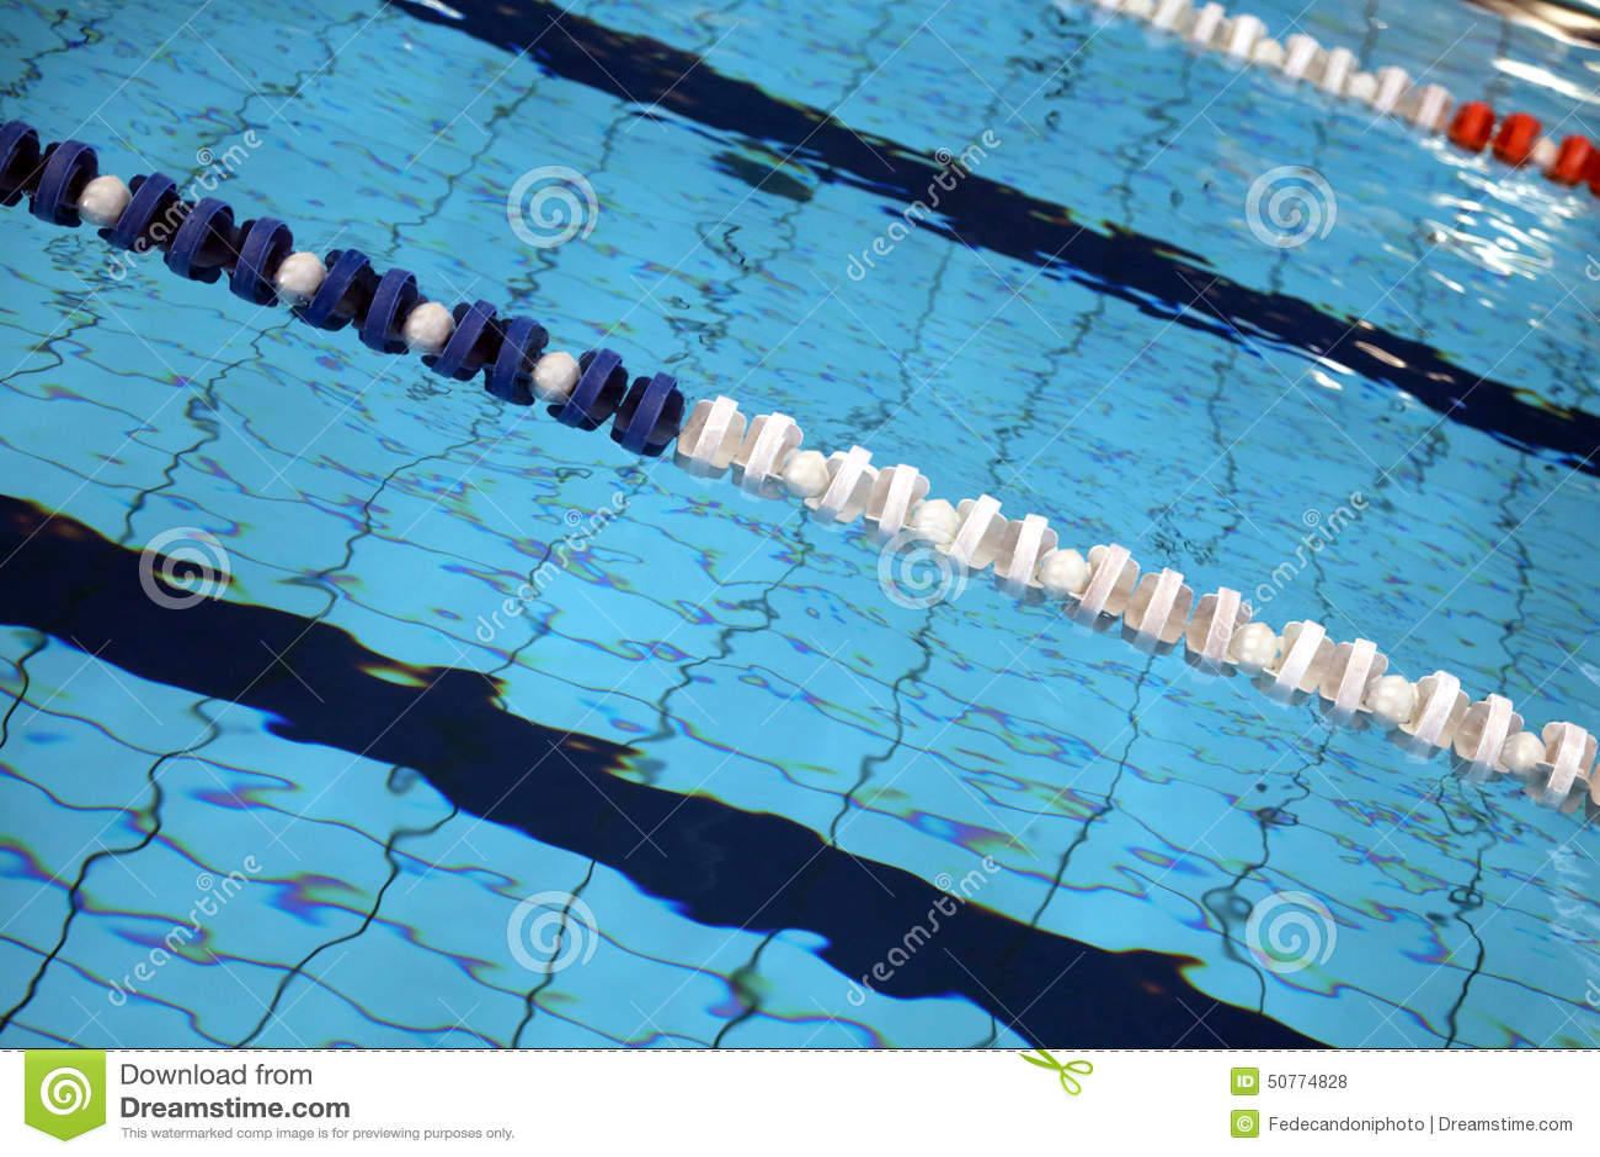 Indoor olympic swimming pool 20 Feet Tall Lane Swimming Races In The Olympic Indoor Swimming Pool Withhout People Liberty University Lane Swimming Races In The Swimming Pool Stock Photo Image Of Lane